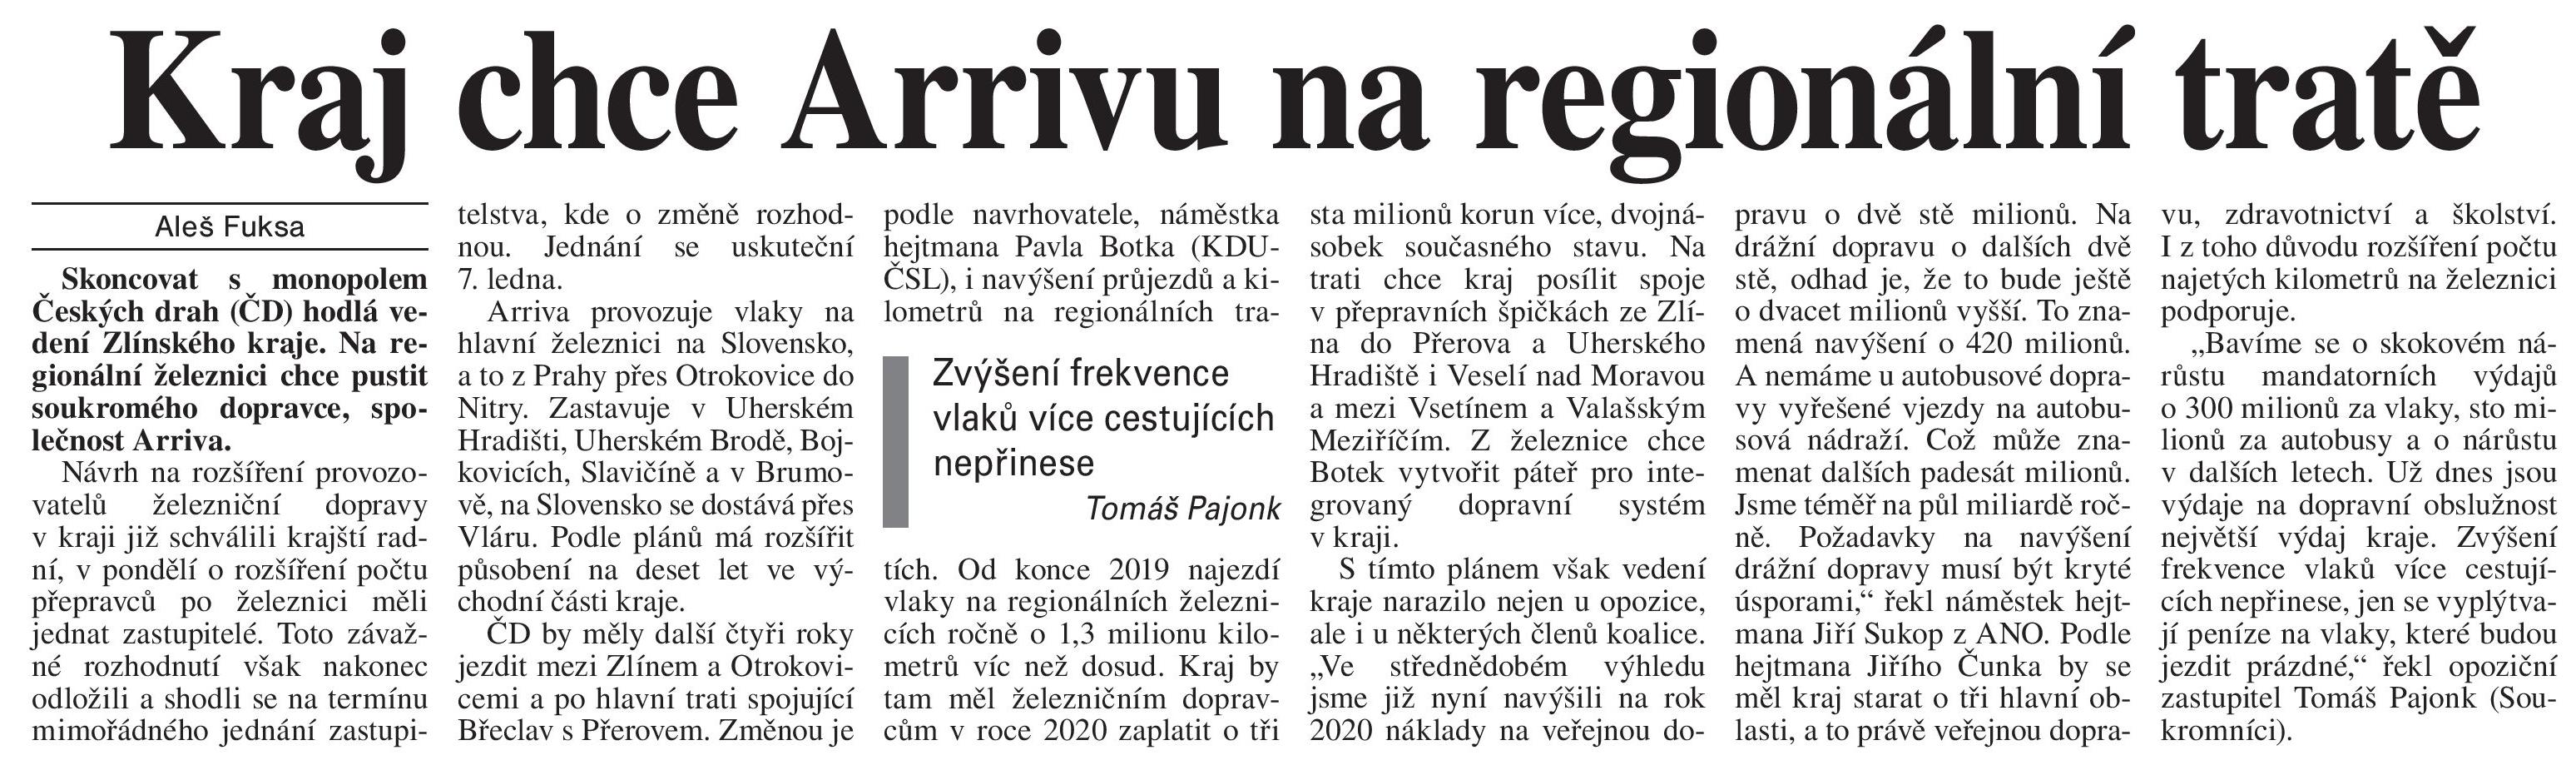 http://zlinskykraj.svobodni.cz/wp-content/uploads/2018/12/Pr%C3%A1vo19122018_2.jpg